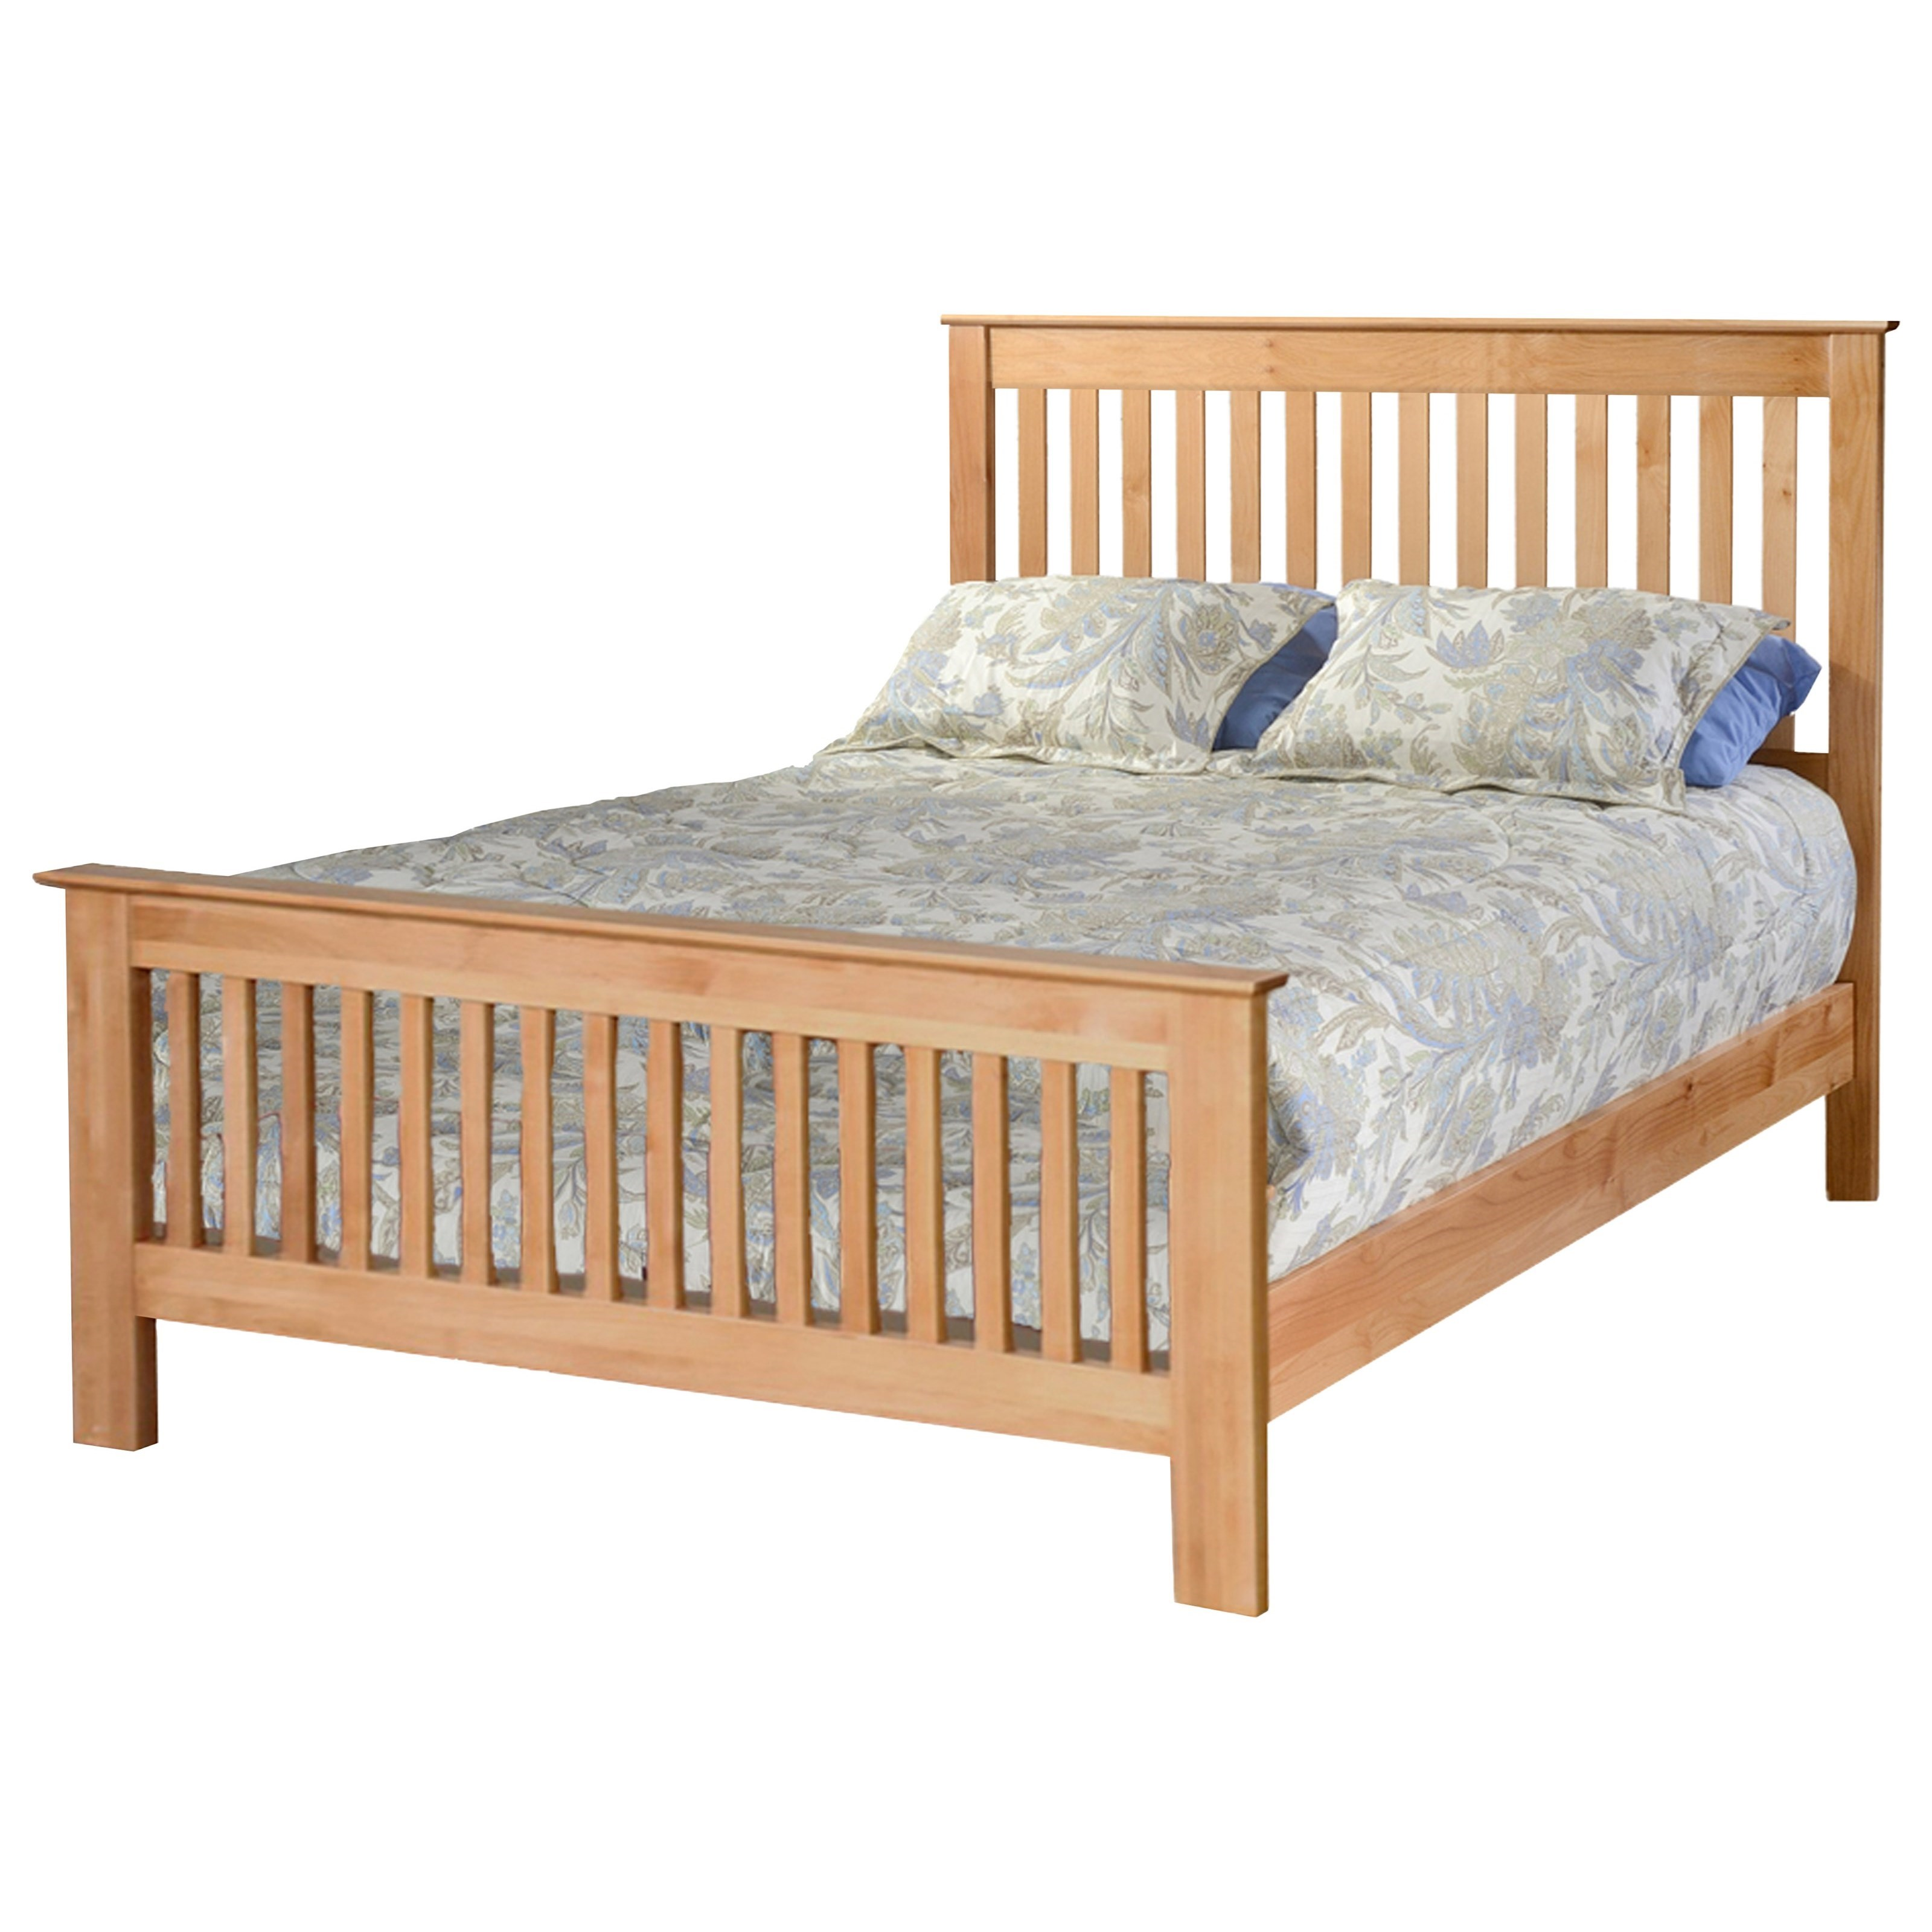 Shaker Full Slat Bed at Williams & Kay